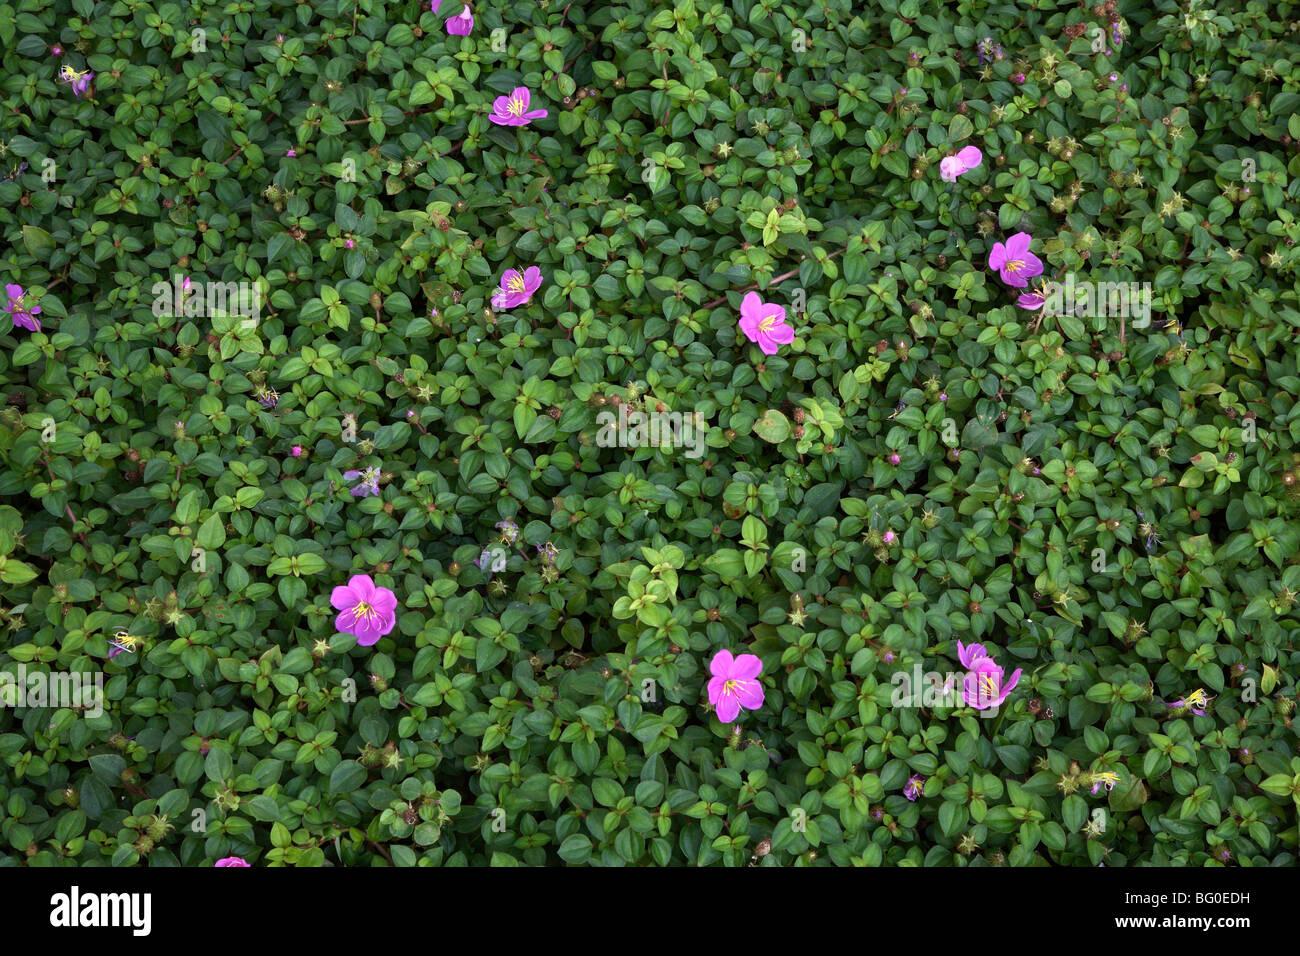 Melastoma malabathricum (Indian rhododendron), used in Ayurvedic medicine in India, Asia - Stock Image